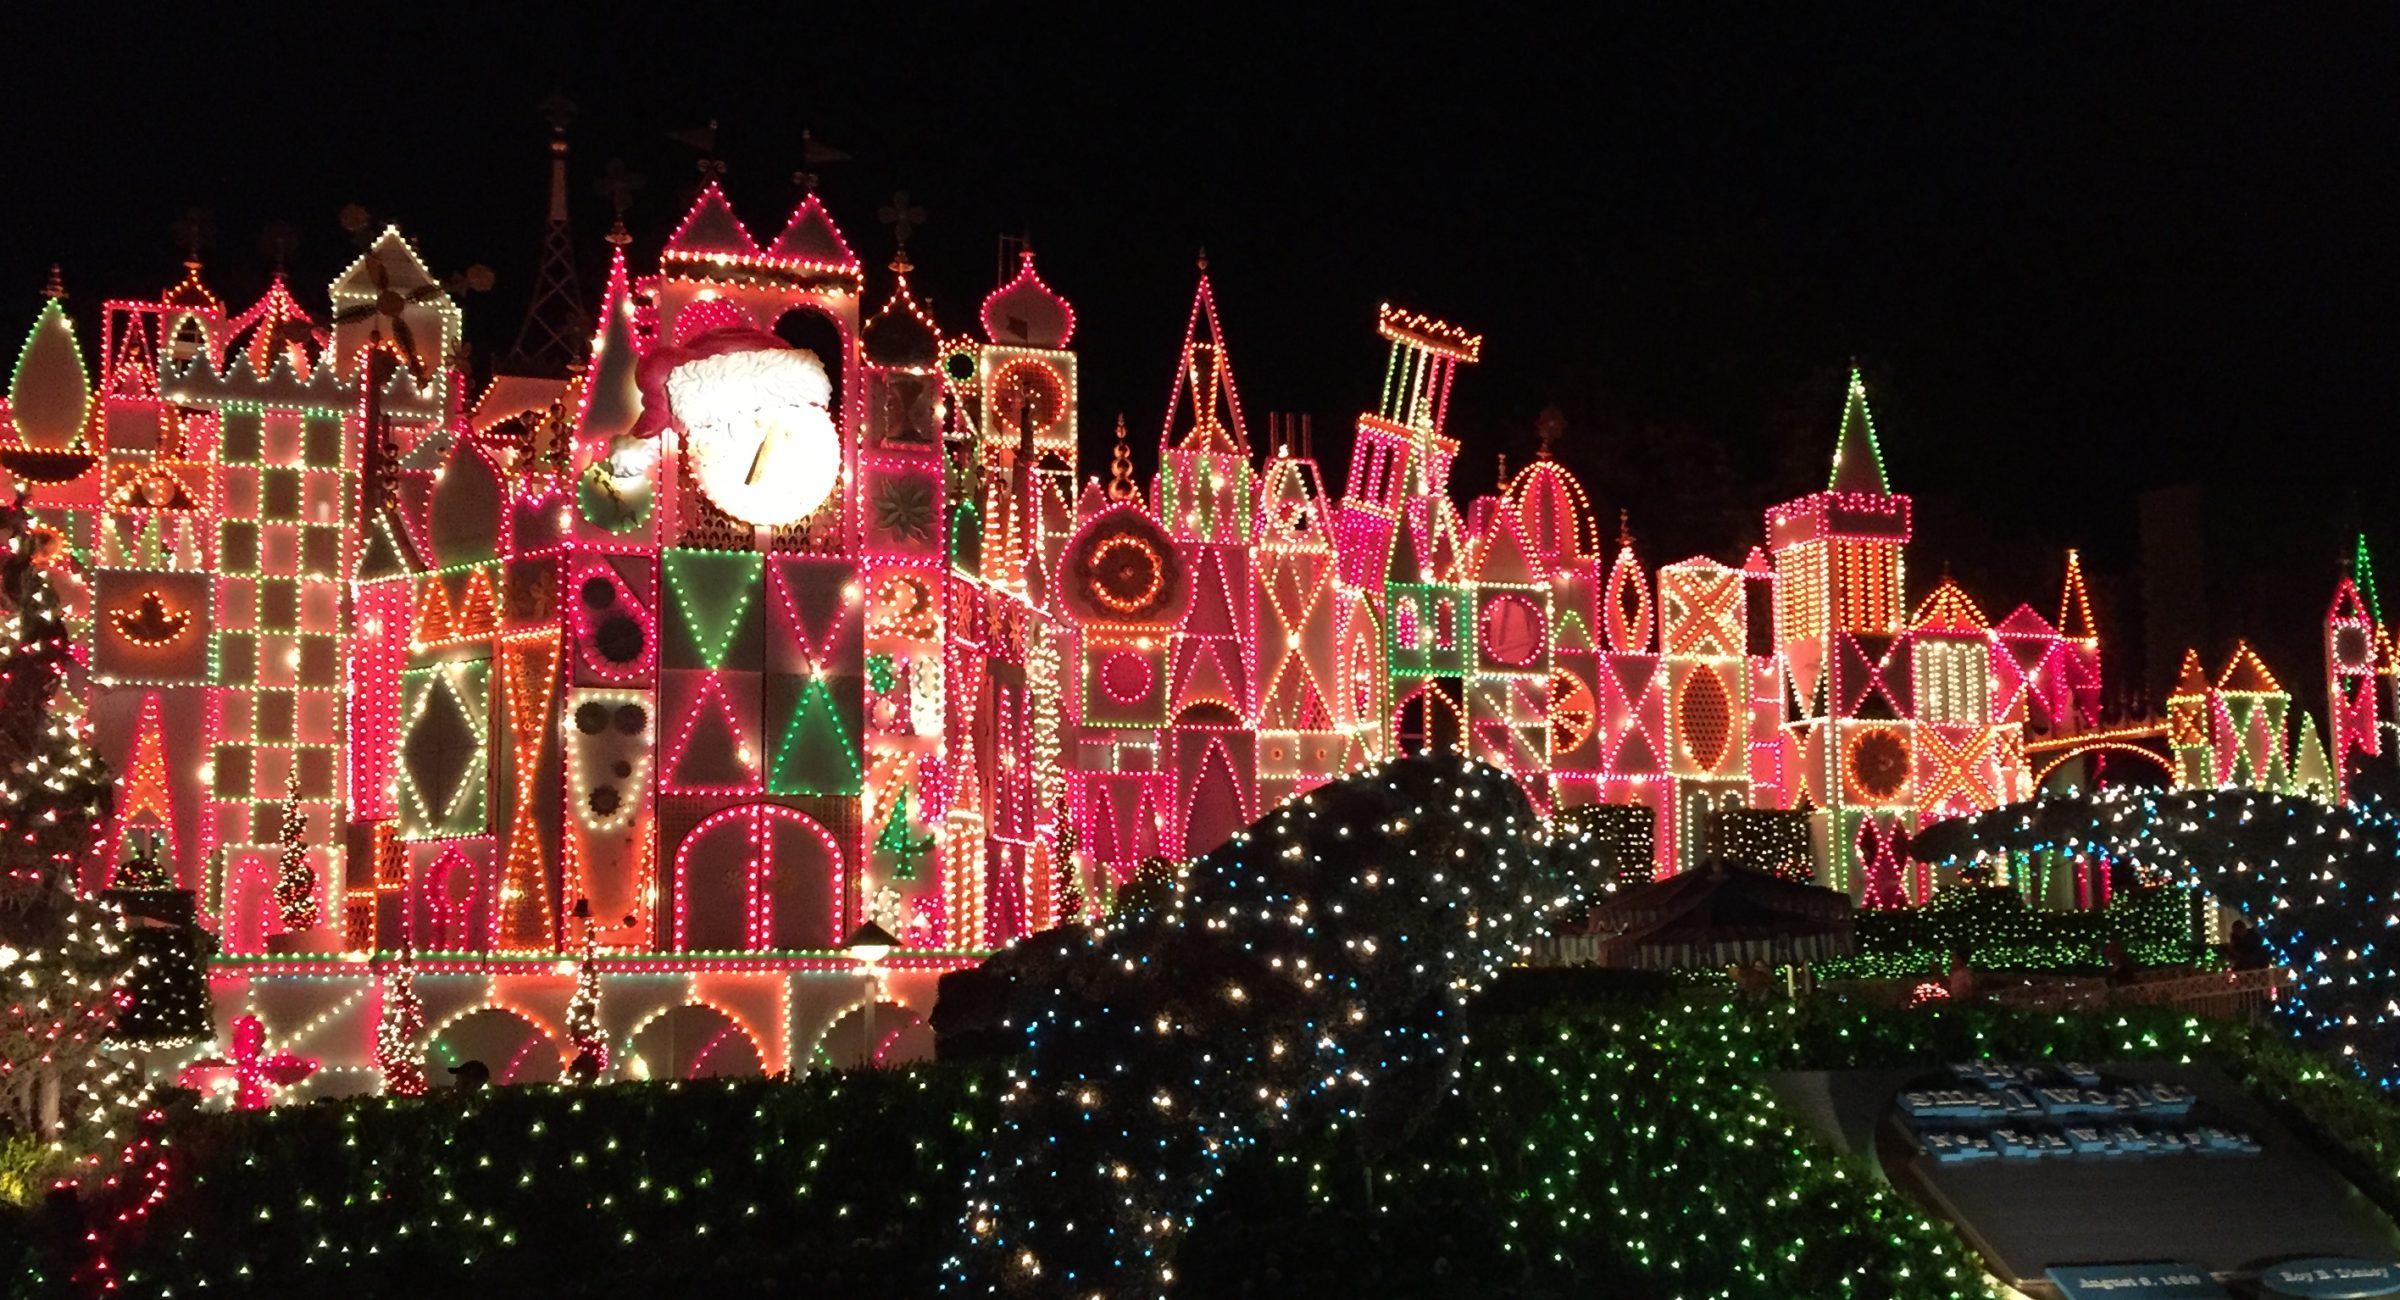 Disneyland - It's a Small World Holiday